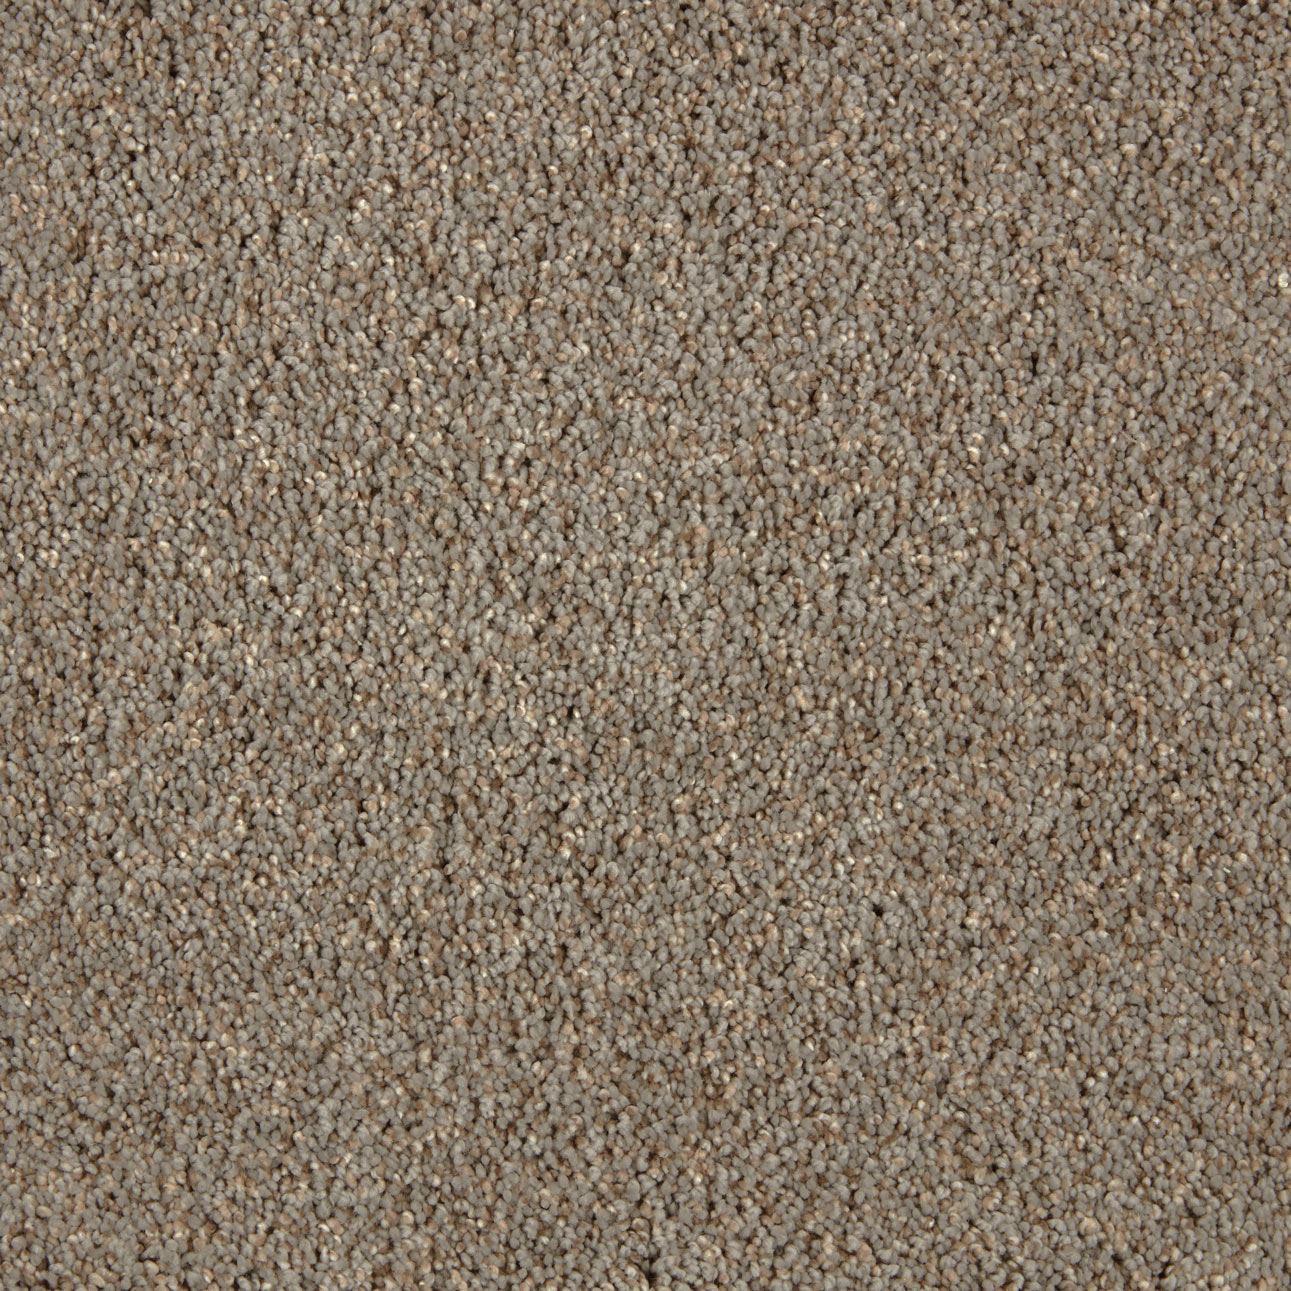 Impress Plush Carpet Bewilder Color